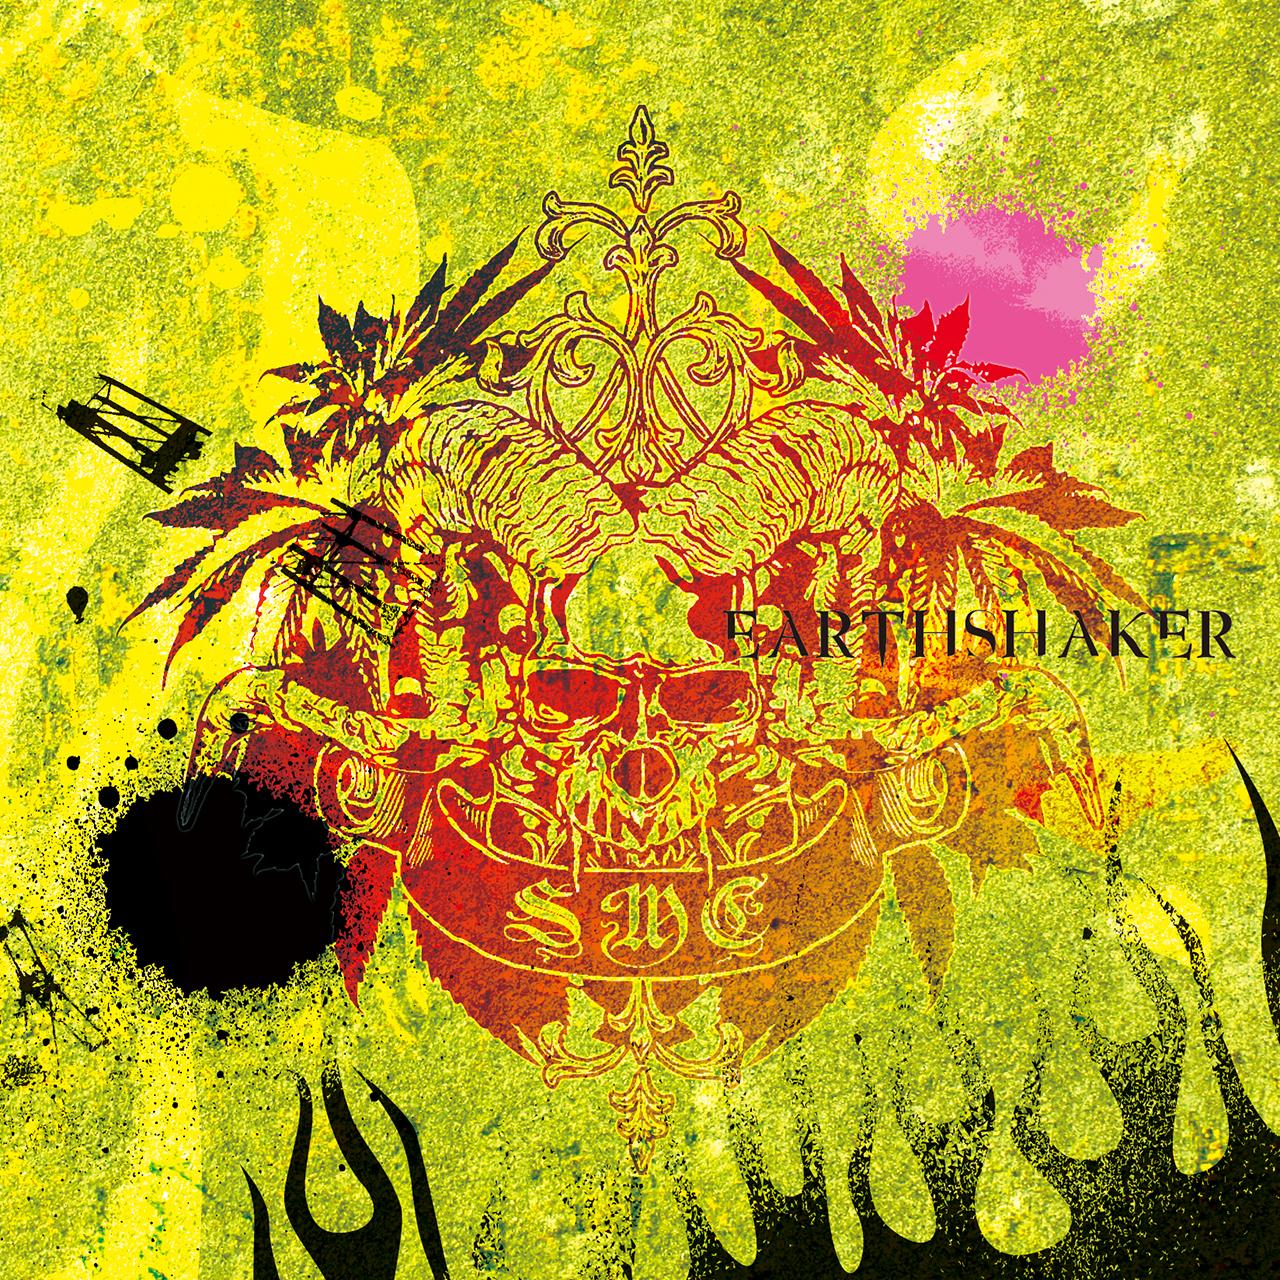 CD:『EARTHSHAKER』SMC - 画像1